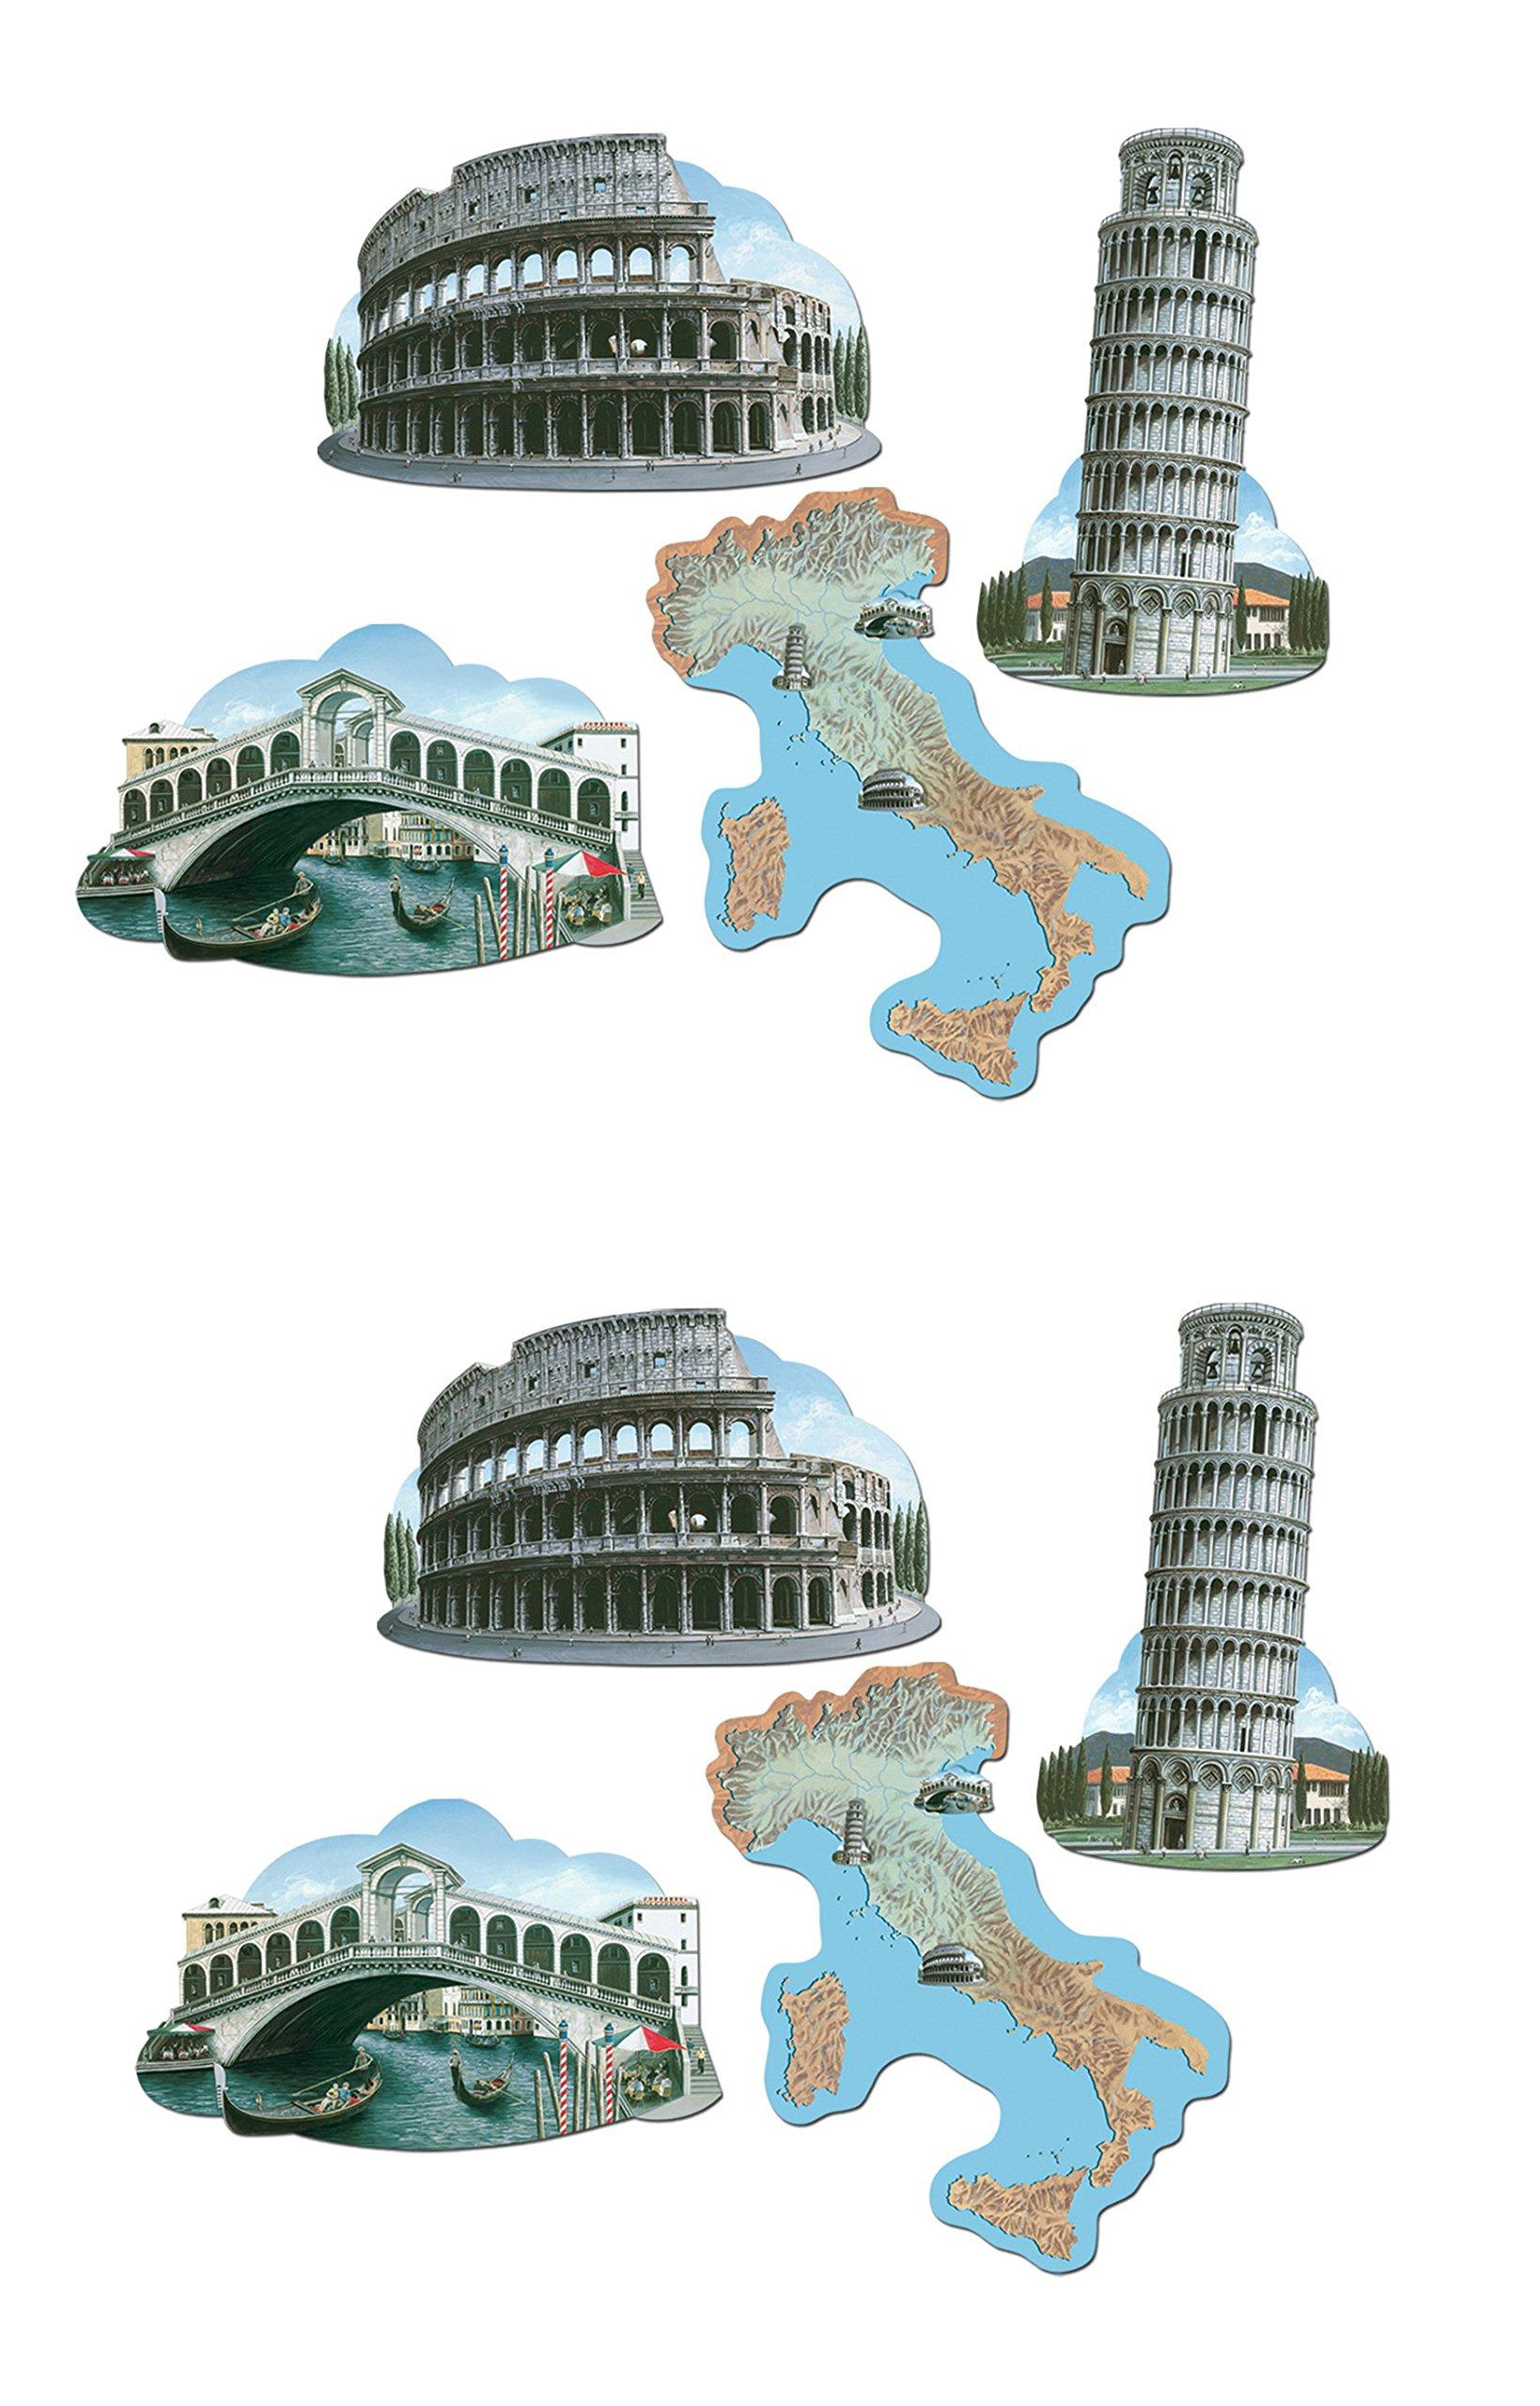 Beistle S55003AZ2, 8 Piece Italian Cutouts, 16.75'' - 17.25'' by Beistle